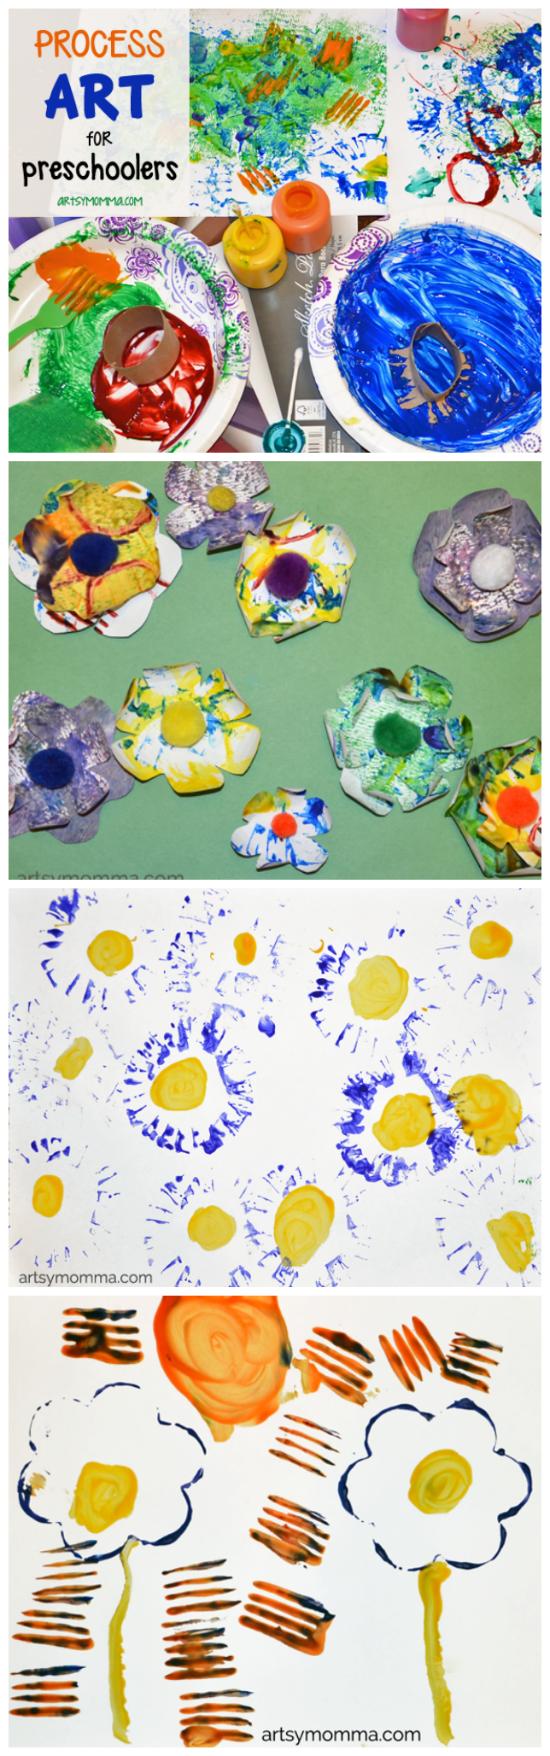 Flower Theme for Preschoolers - Process Art